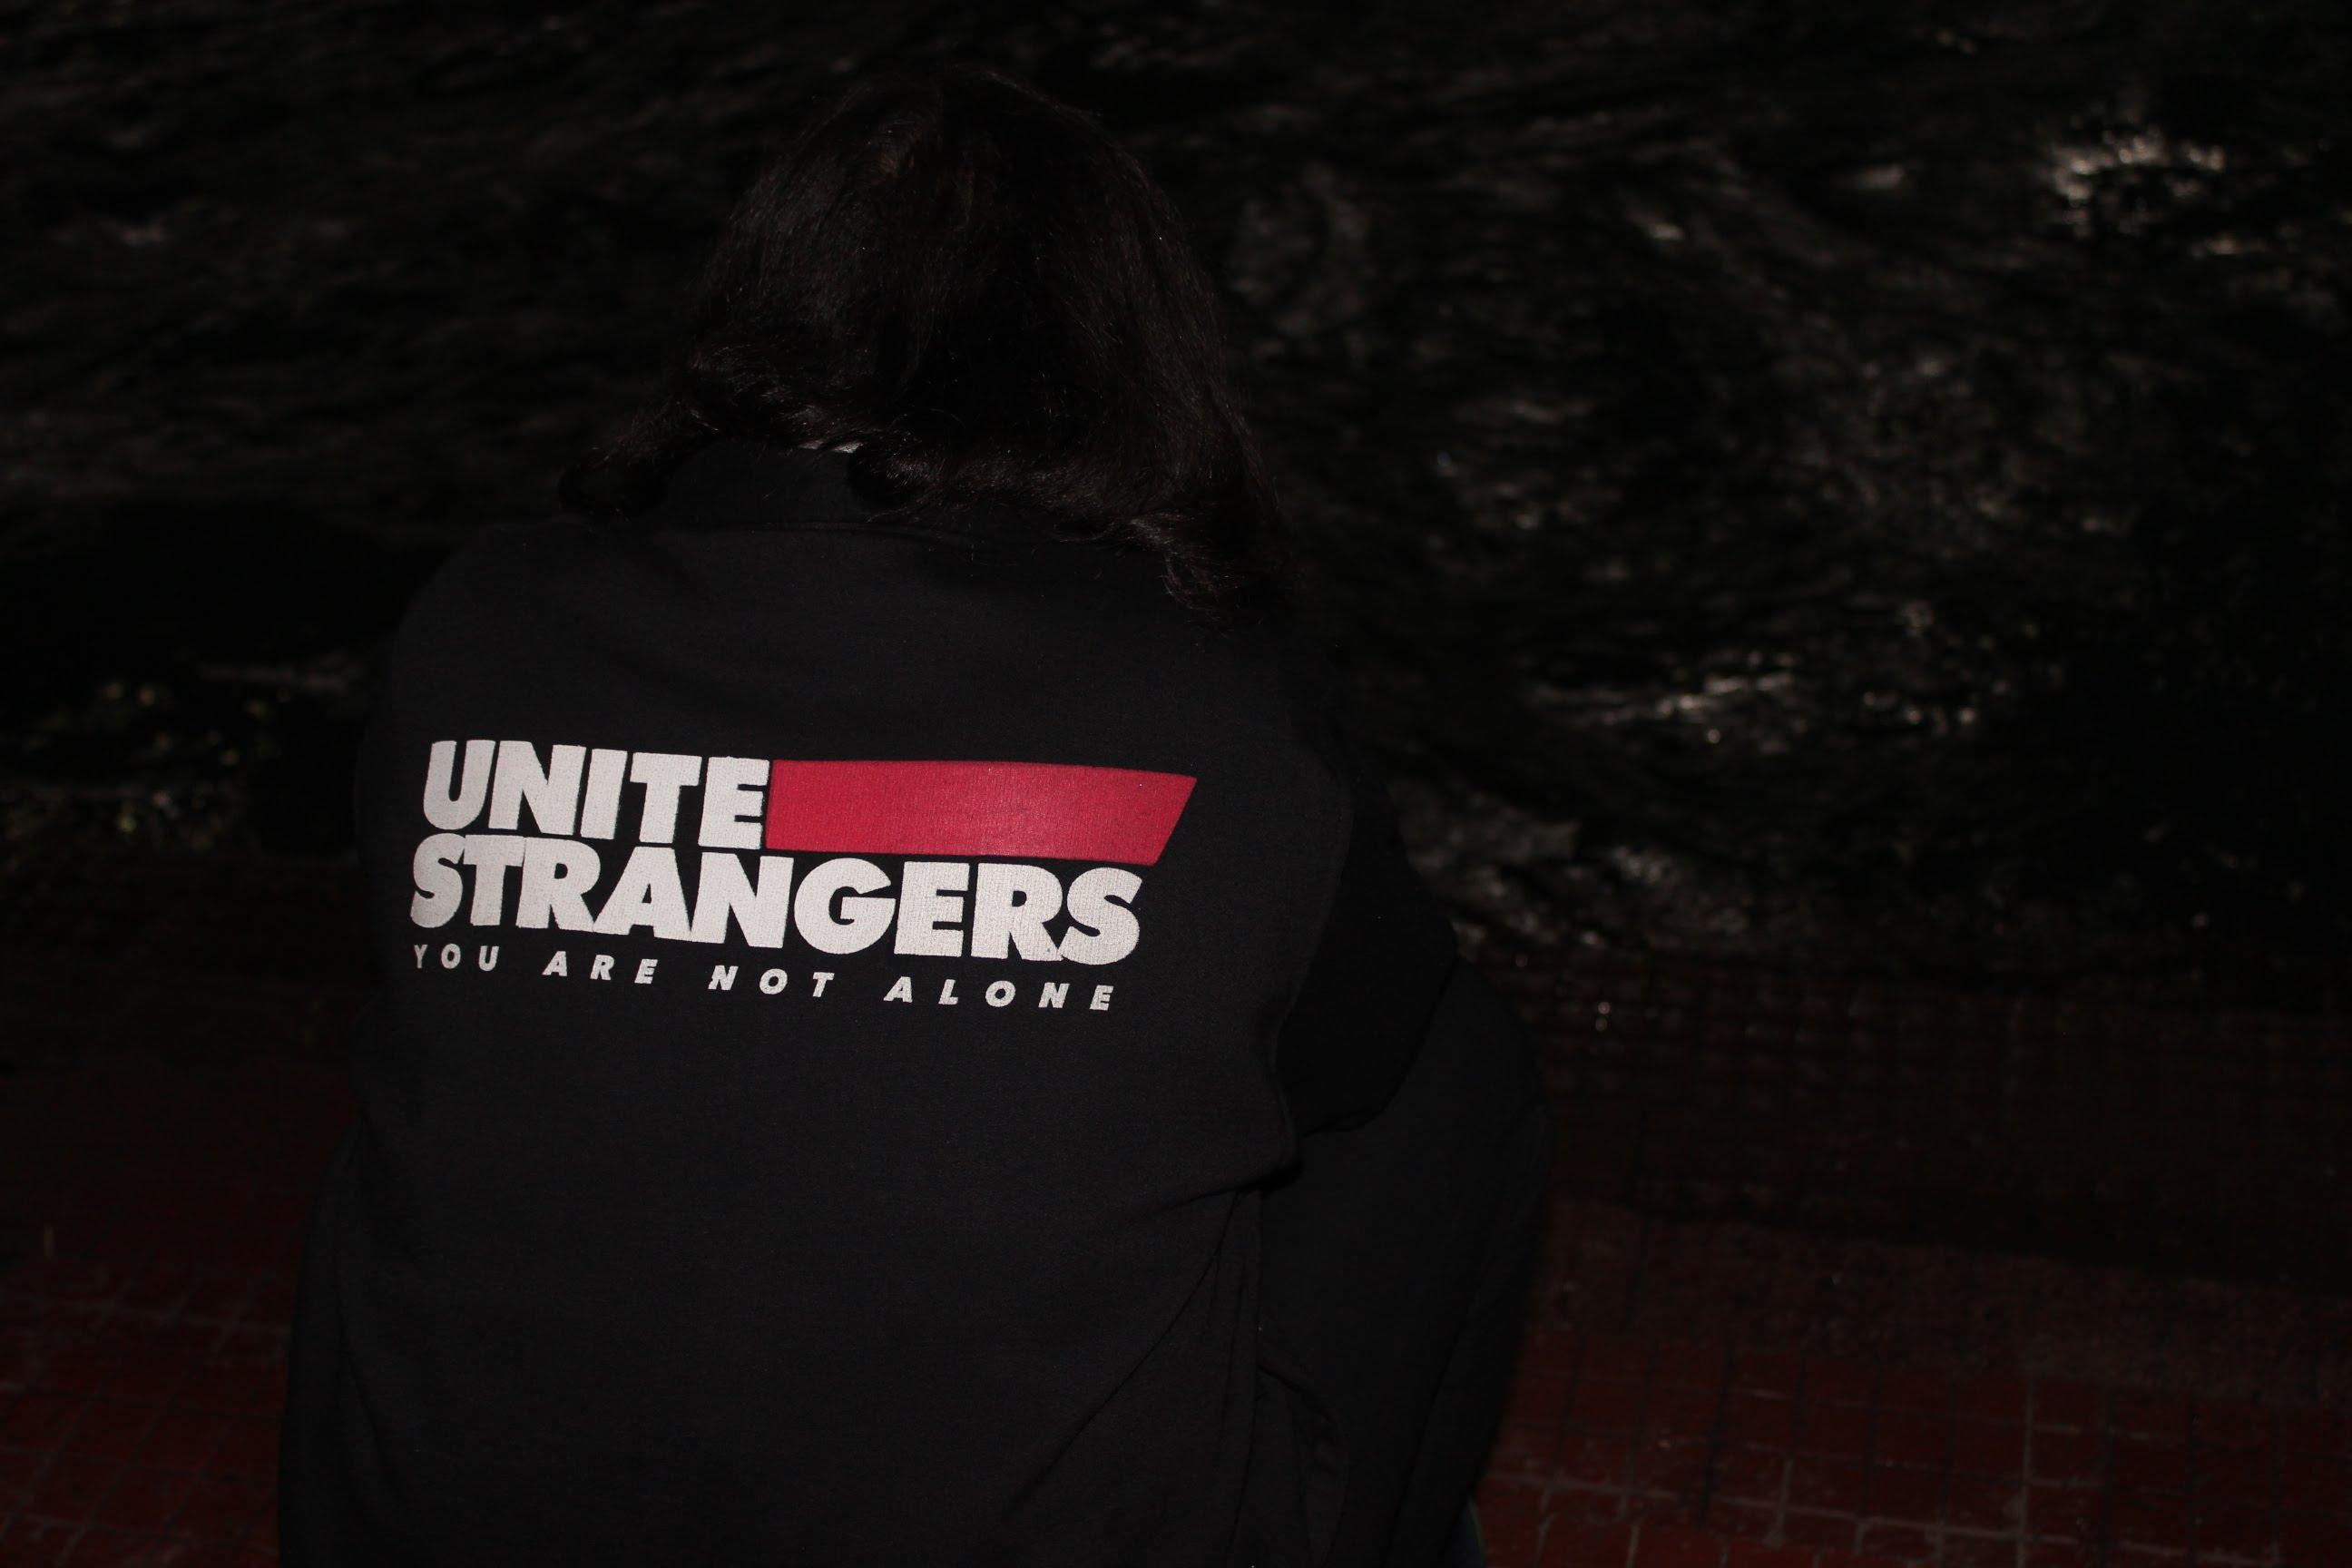 Unite-Strangers, levenstylo